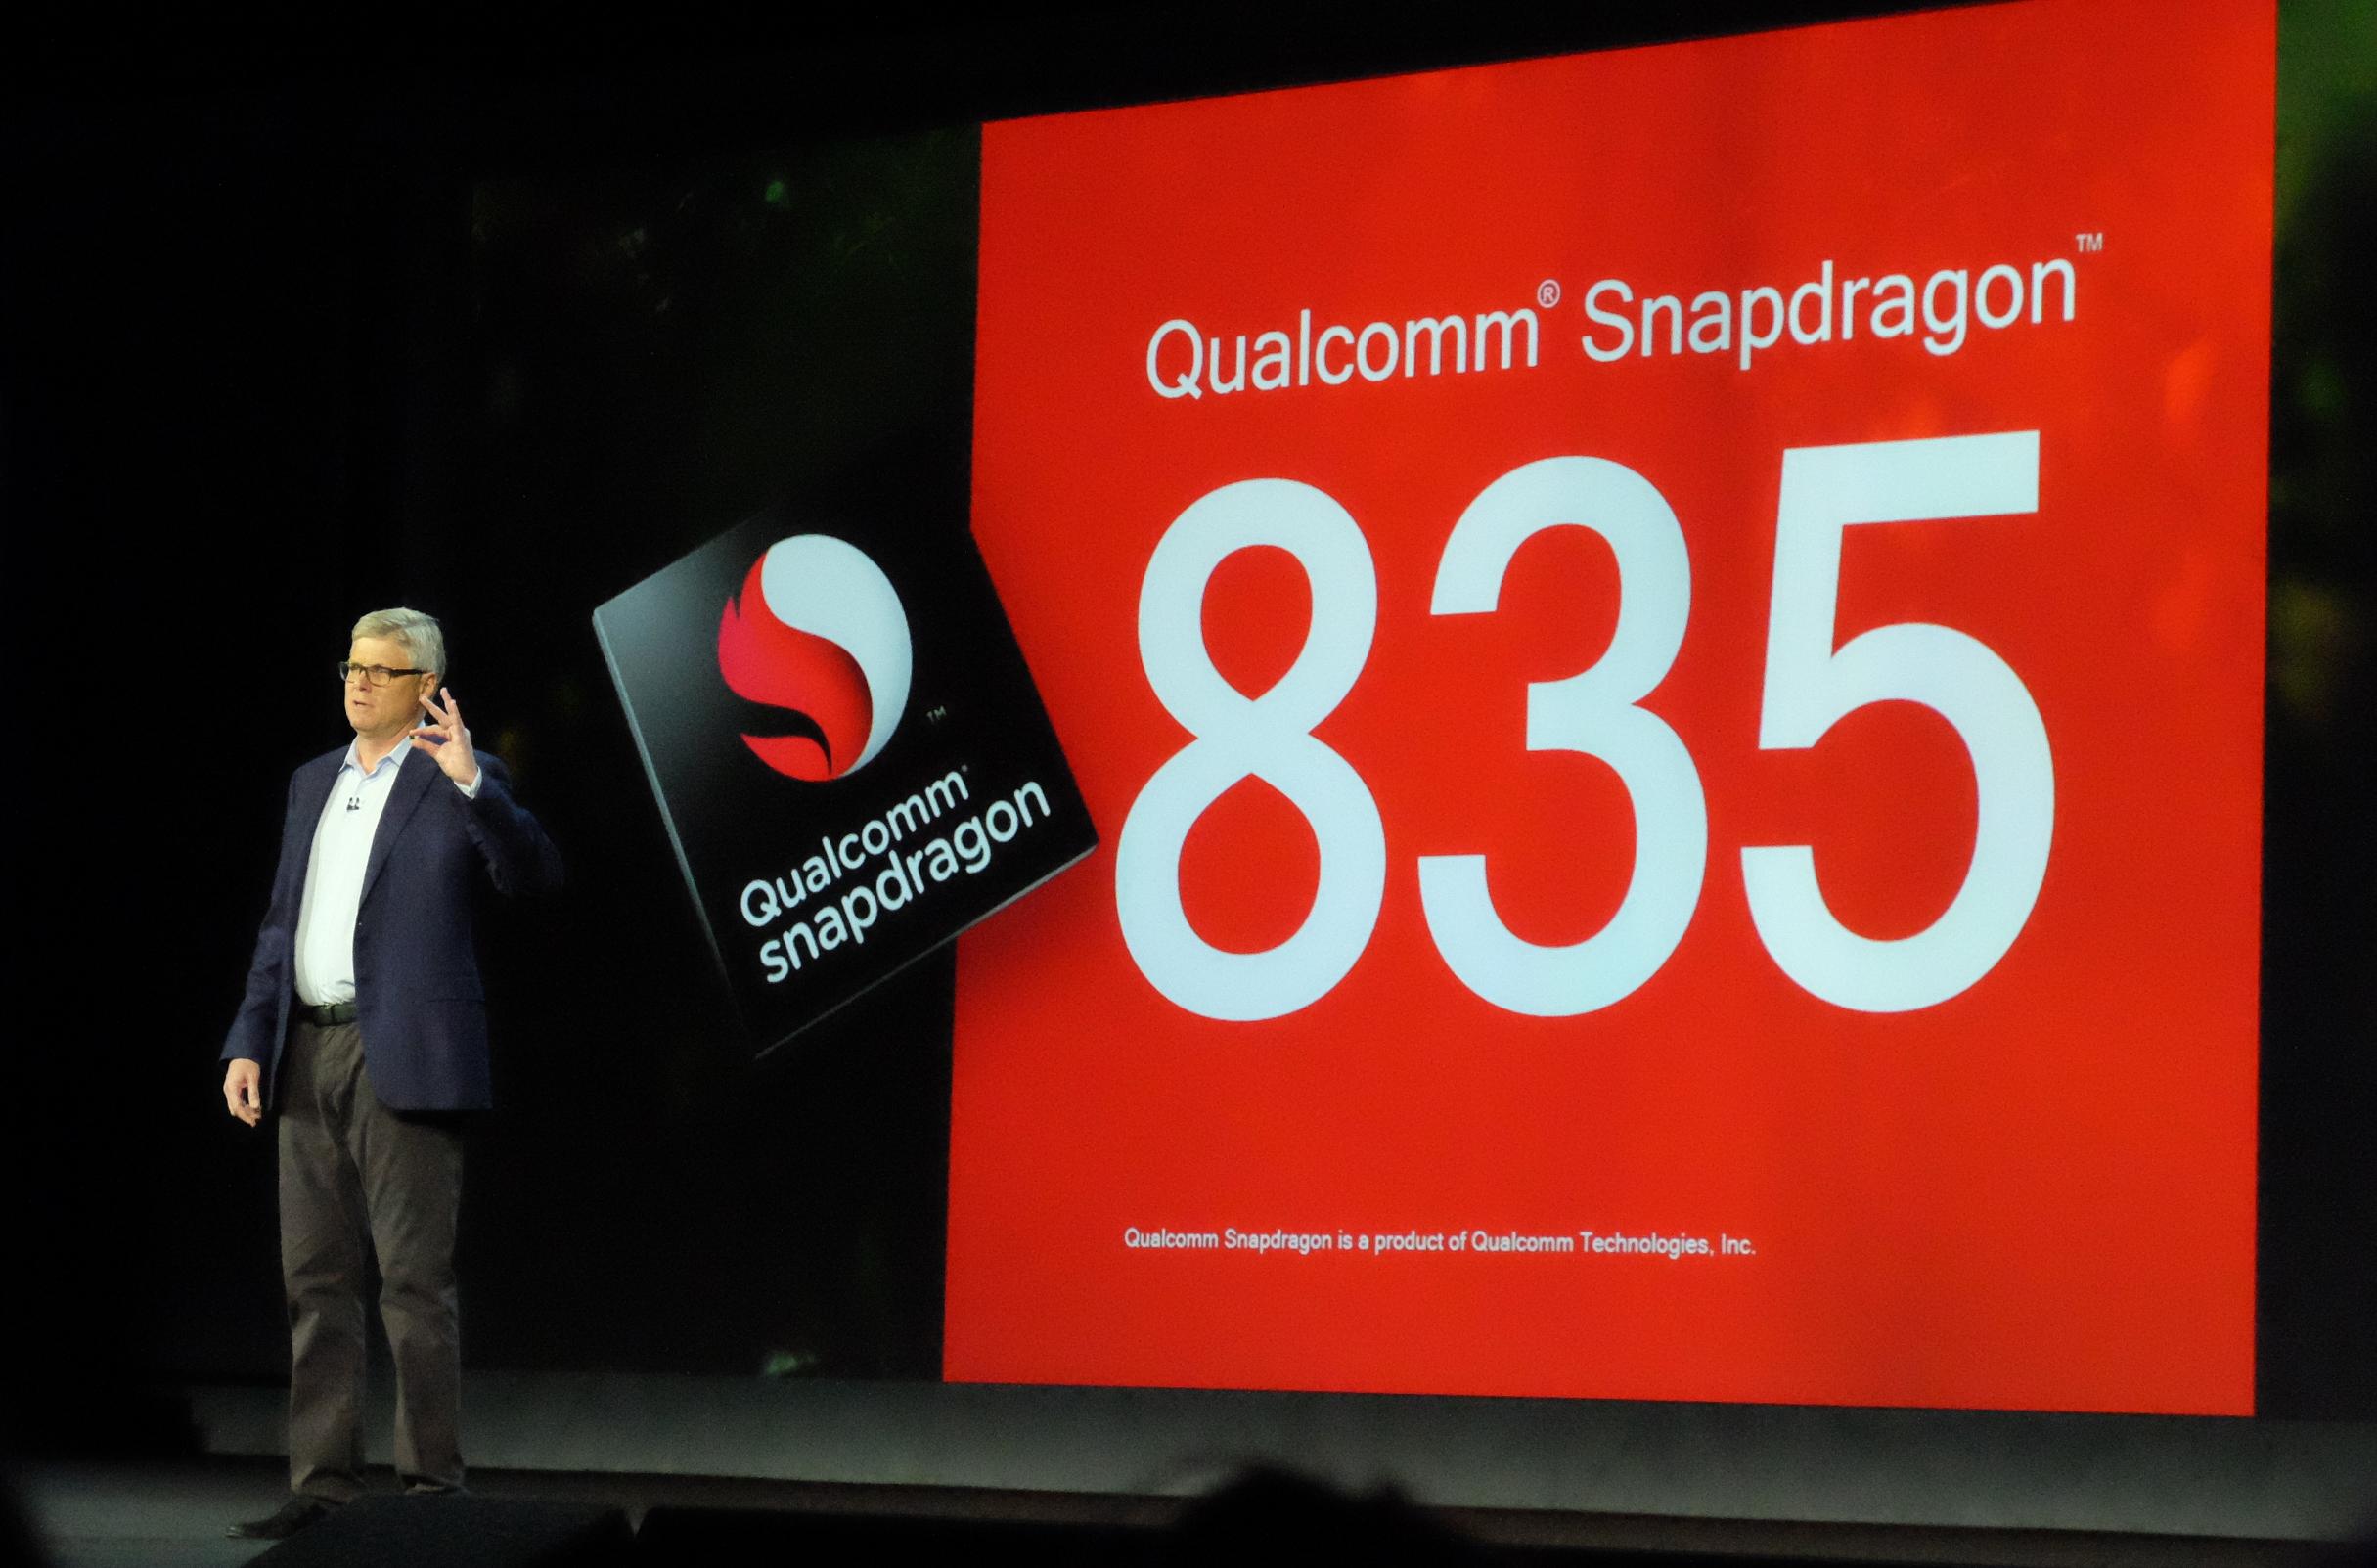 Qualcommは次世代チップセットSnapdragon 835を発表。